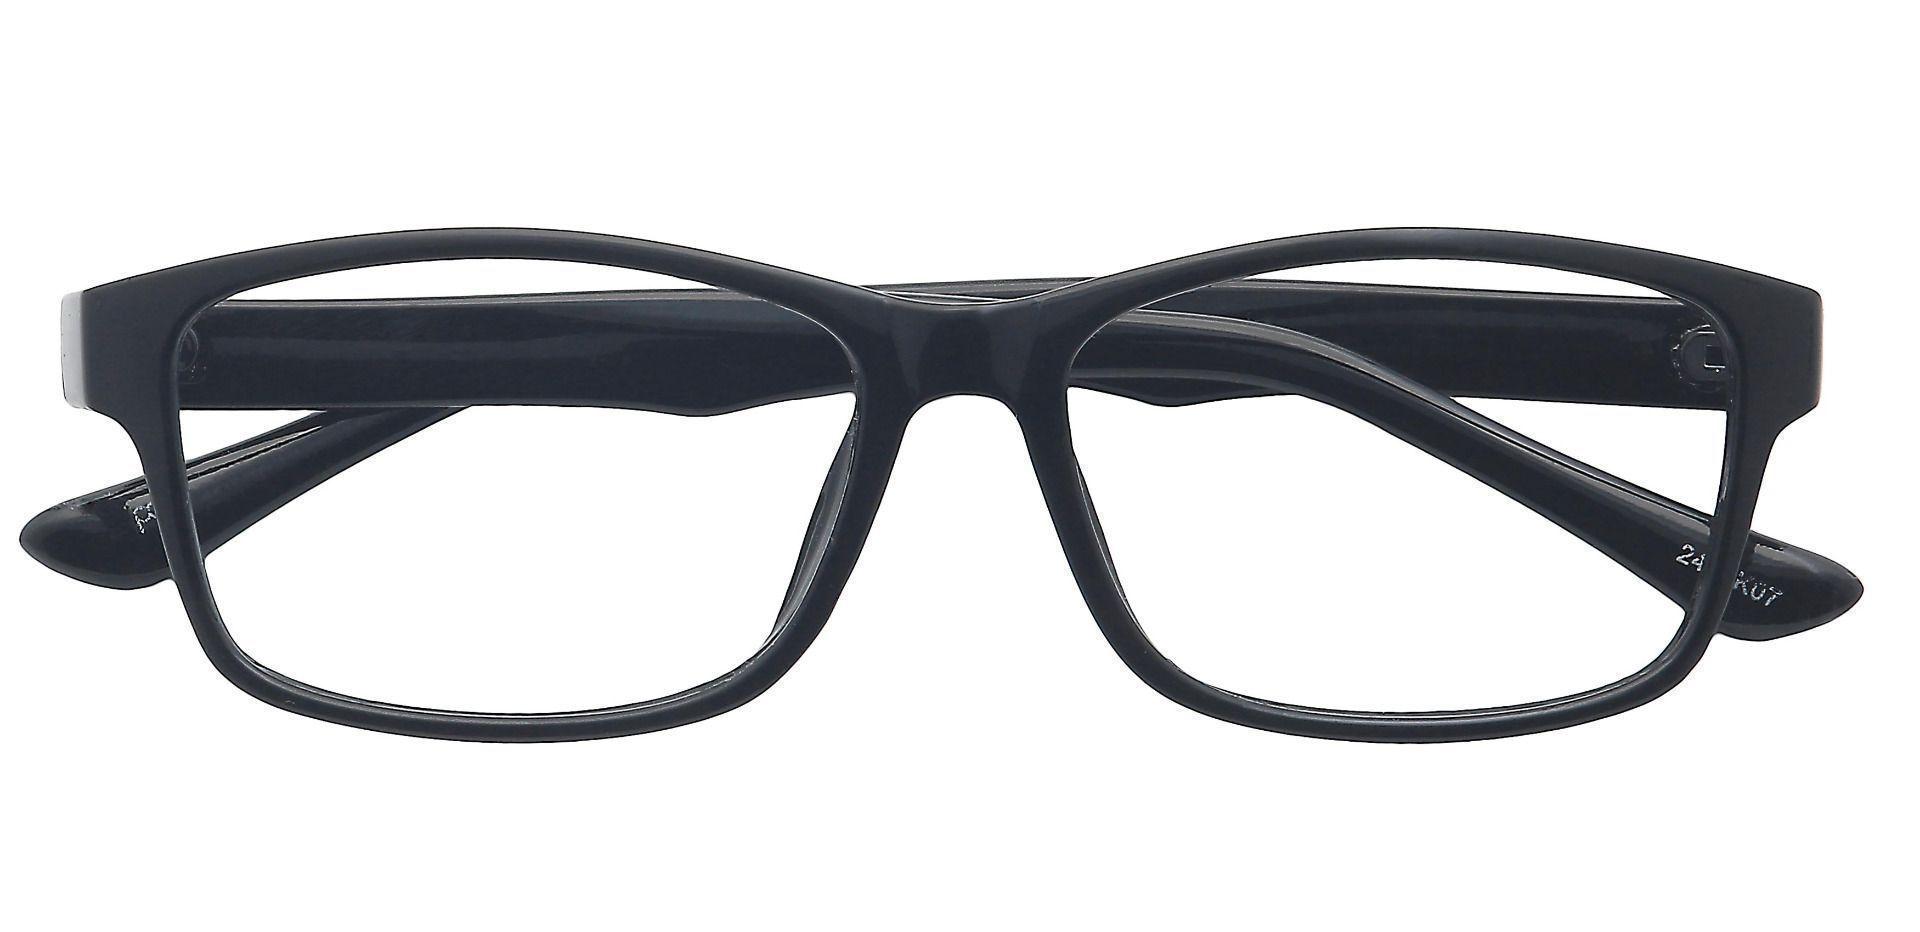 Ian Rectangle Prescription Glasses - Black